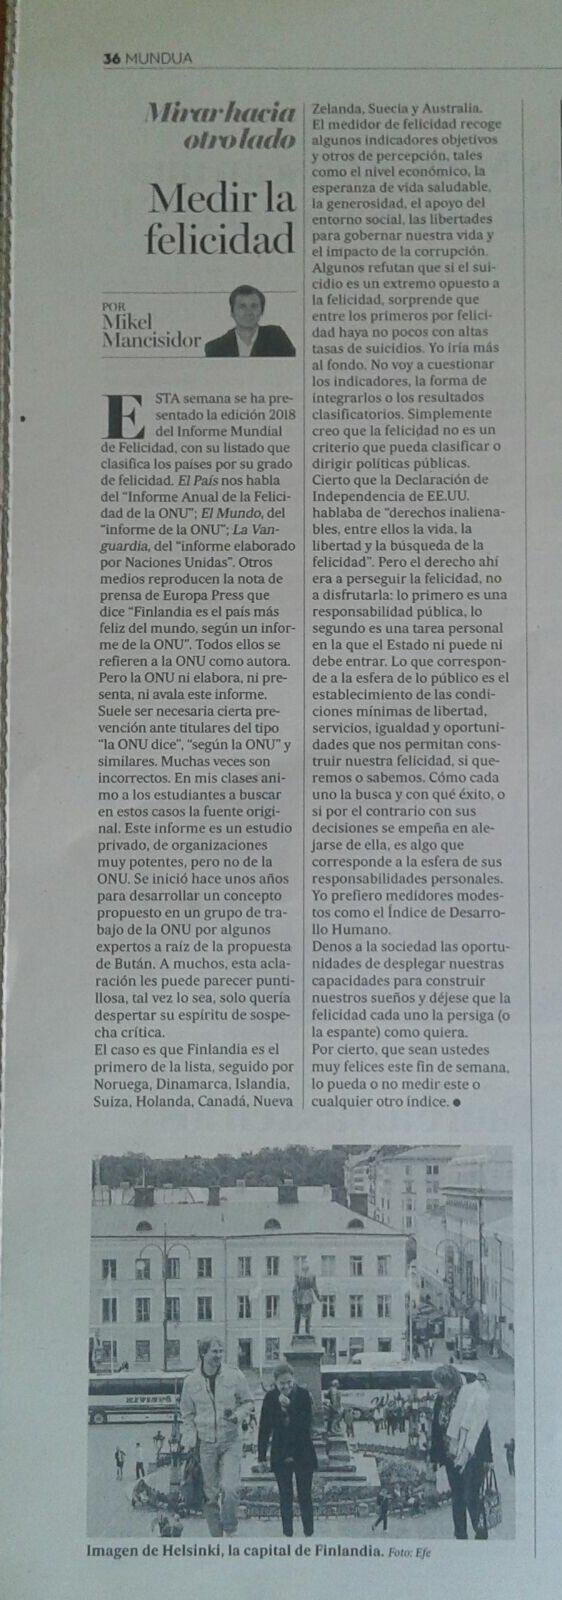 http://m.deia.eus/2018/03/17/opinion/tribuna-abierta/medir-la-felicidad